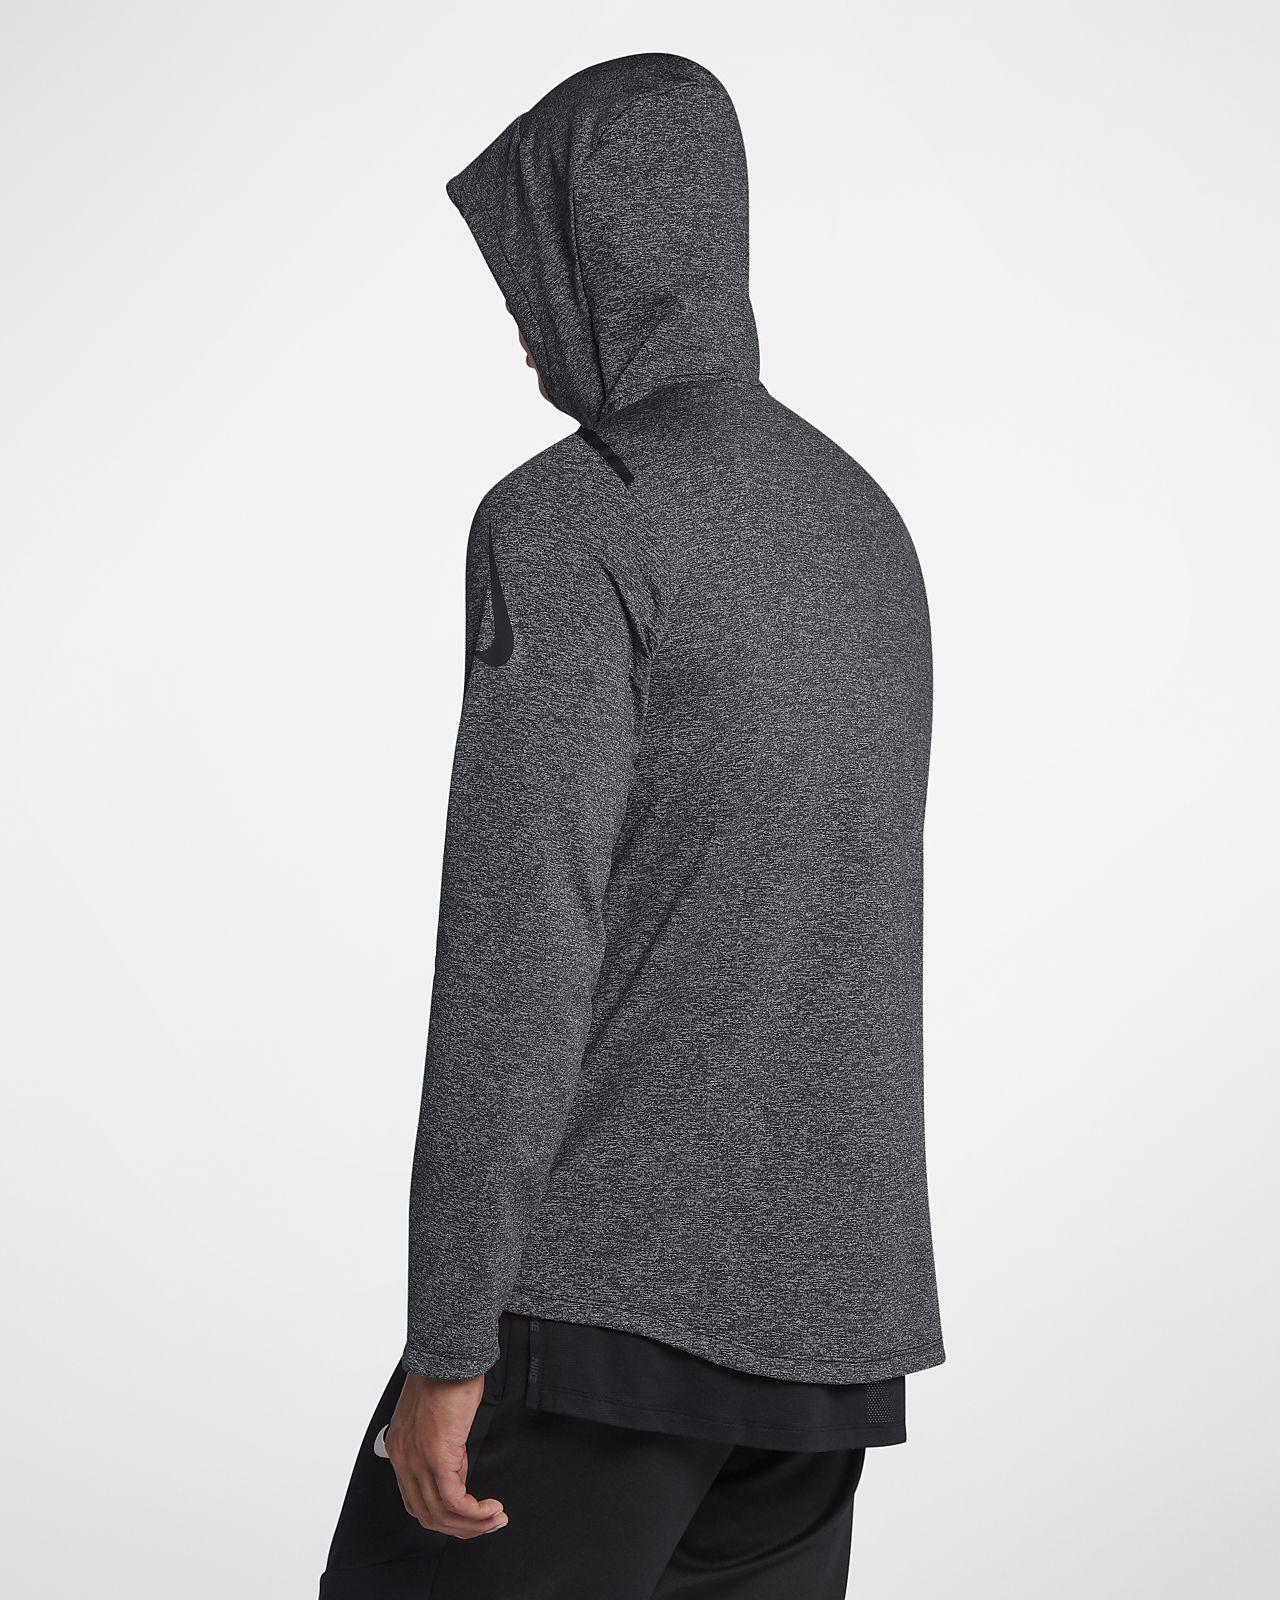 ce7da386eb9 ... Nike Dri-FIT Sudadera de entrenamiento de manga larga con capucha y  cremallera completa -